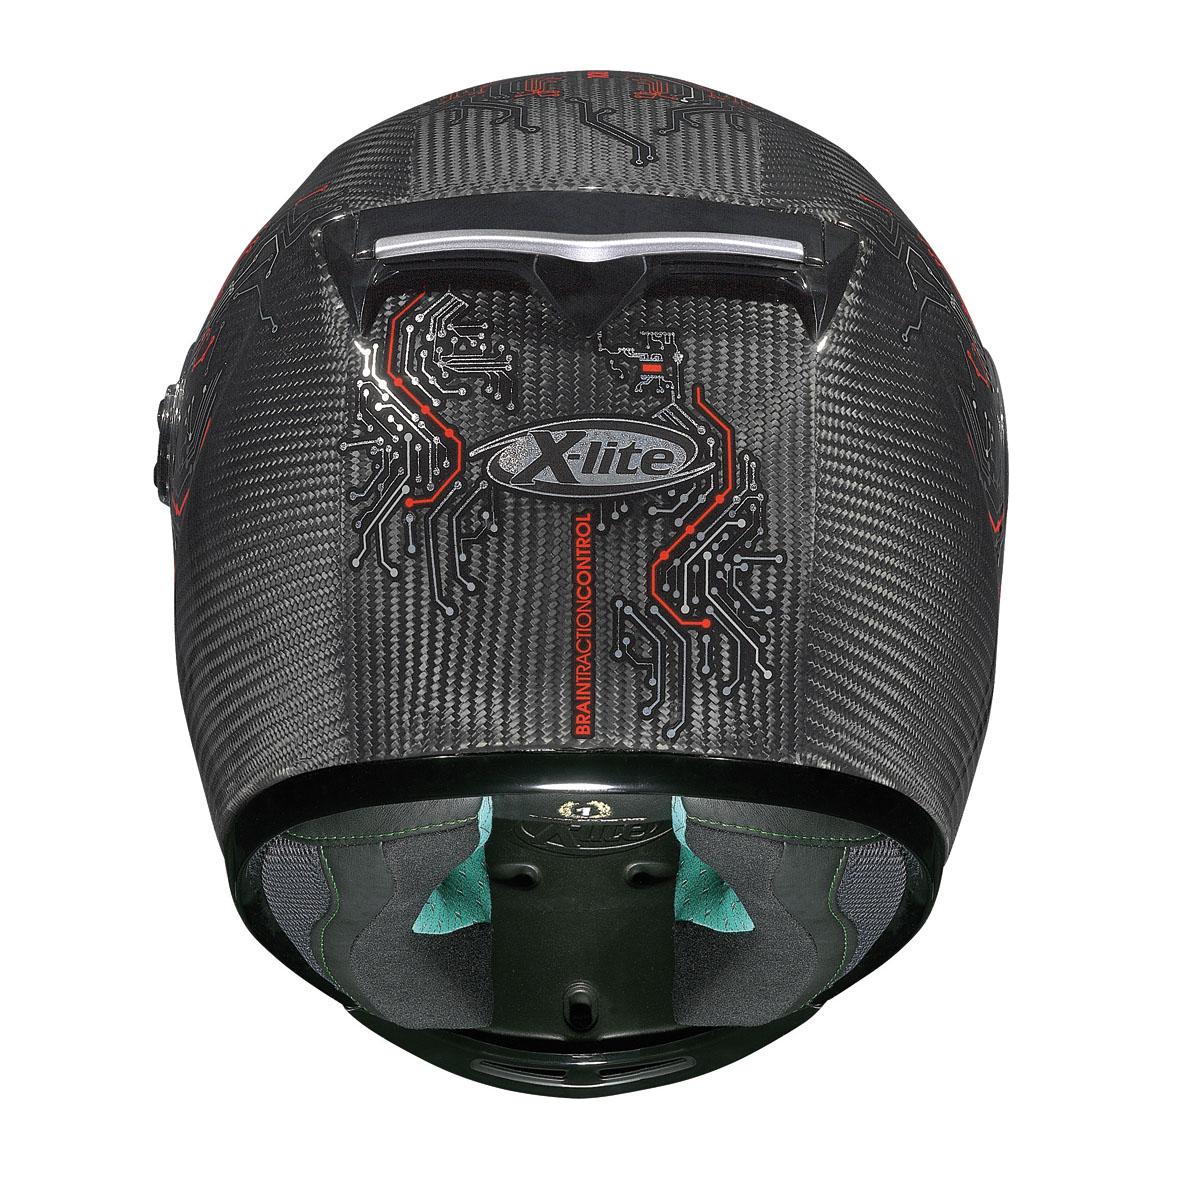 x lite helmet x 802rr ultra carbon btc 11 carbon. Black Bedroom Furniture Sets. Home Design Ideas